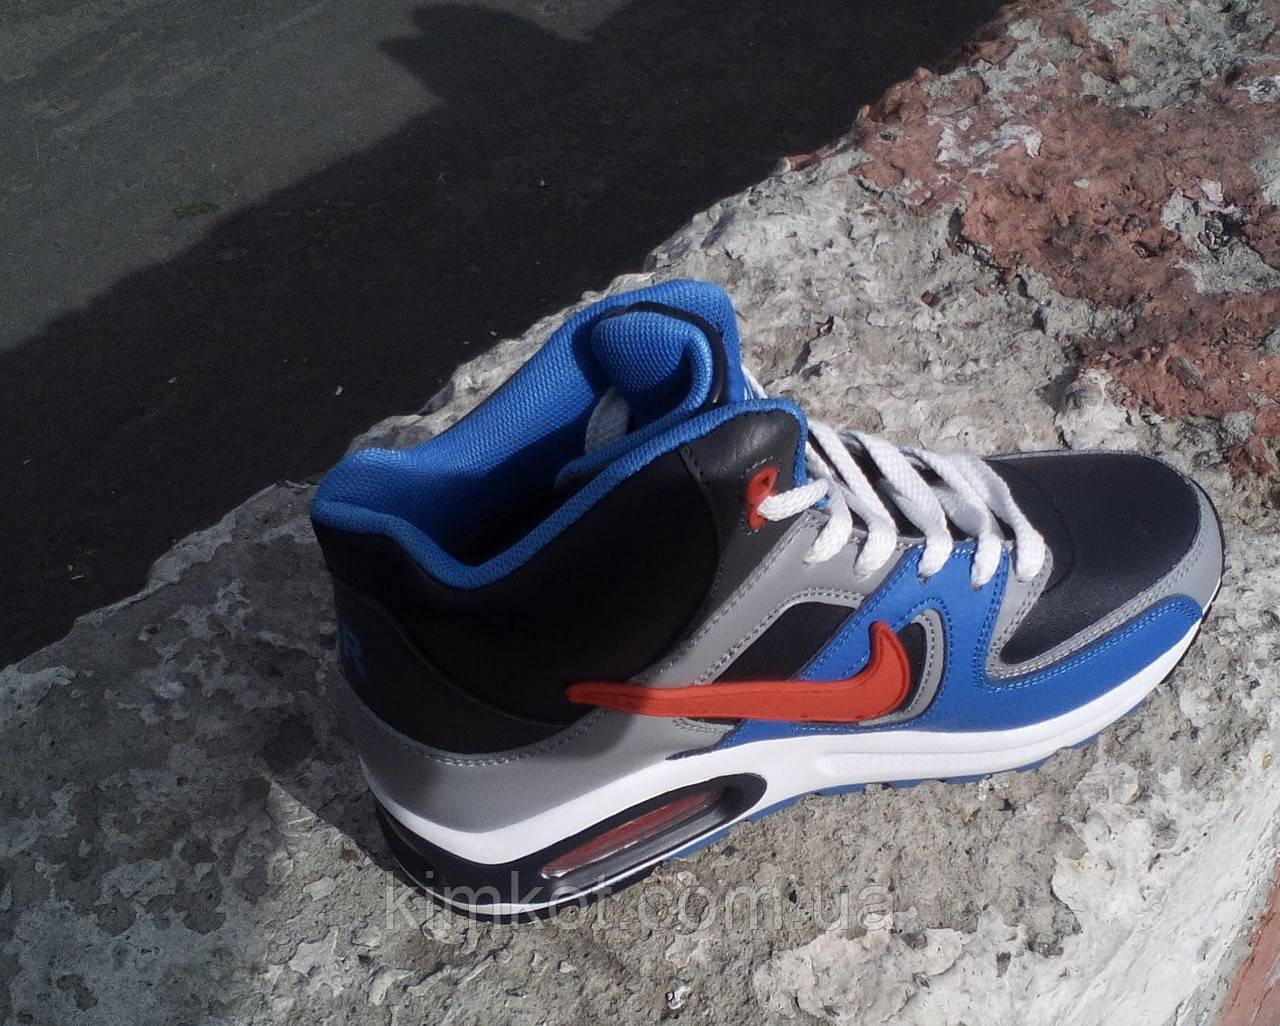 a0d2fdf0 Подростковые зимние кроссовки на девочку Nike AIR MAX 35 и 36 р-р, фото